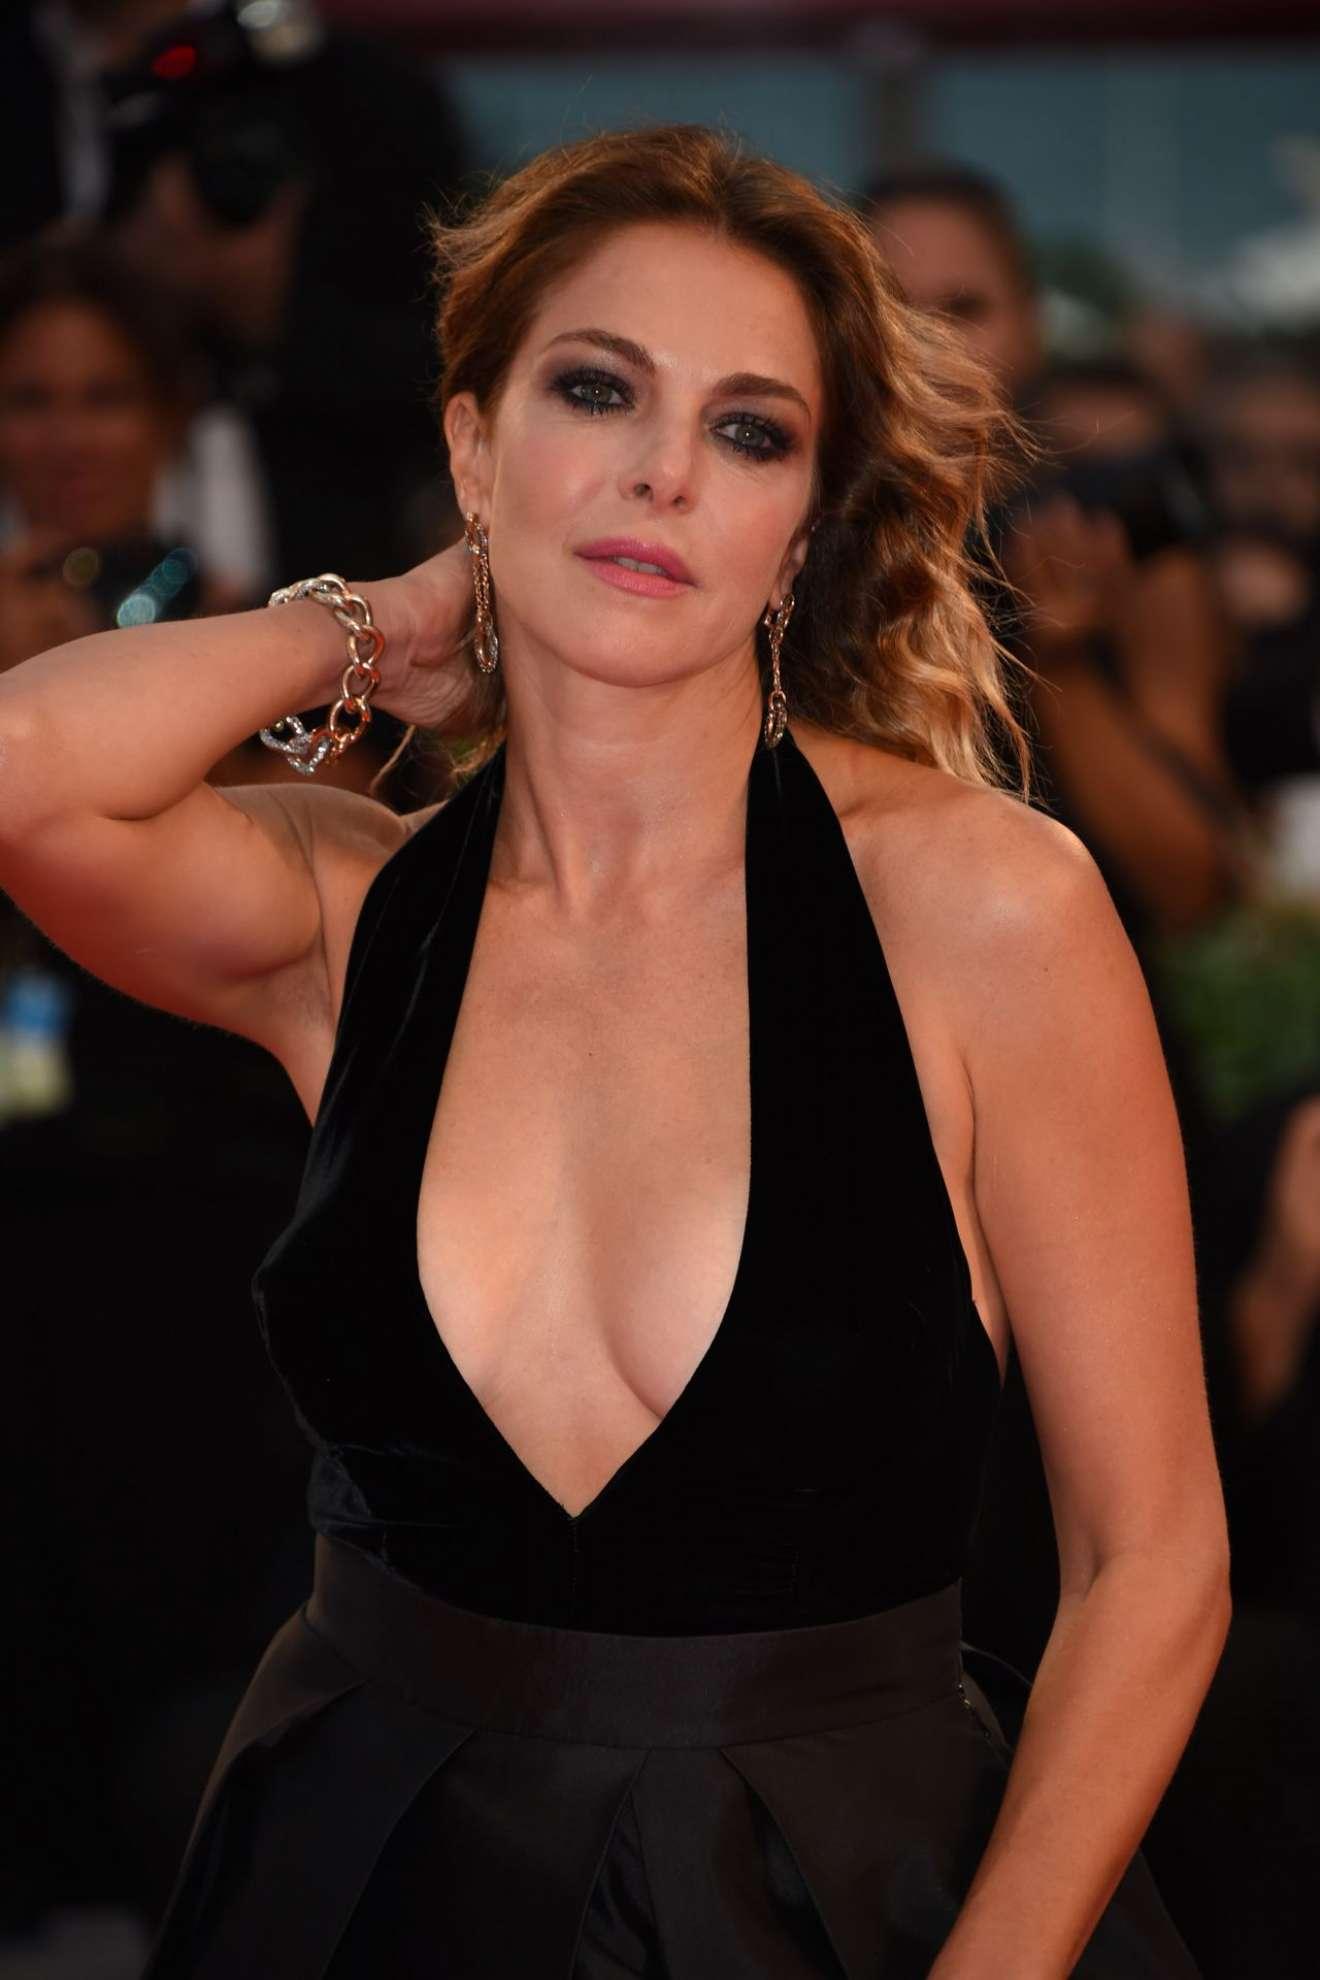 Photos Claudia Gerini nudes (55 foto and video), Pussy, Leaked, Boobs, in bikini 2015